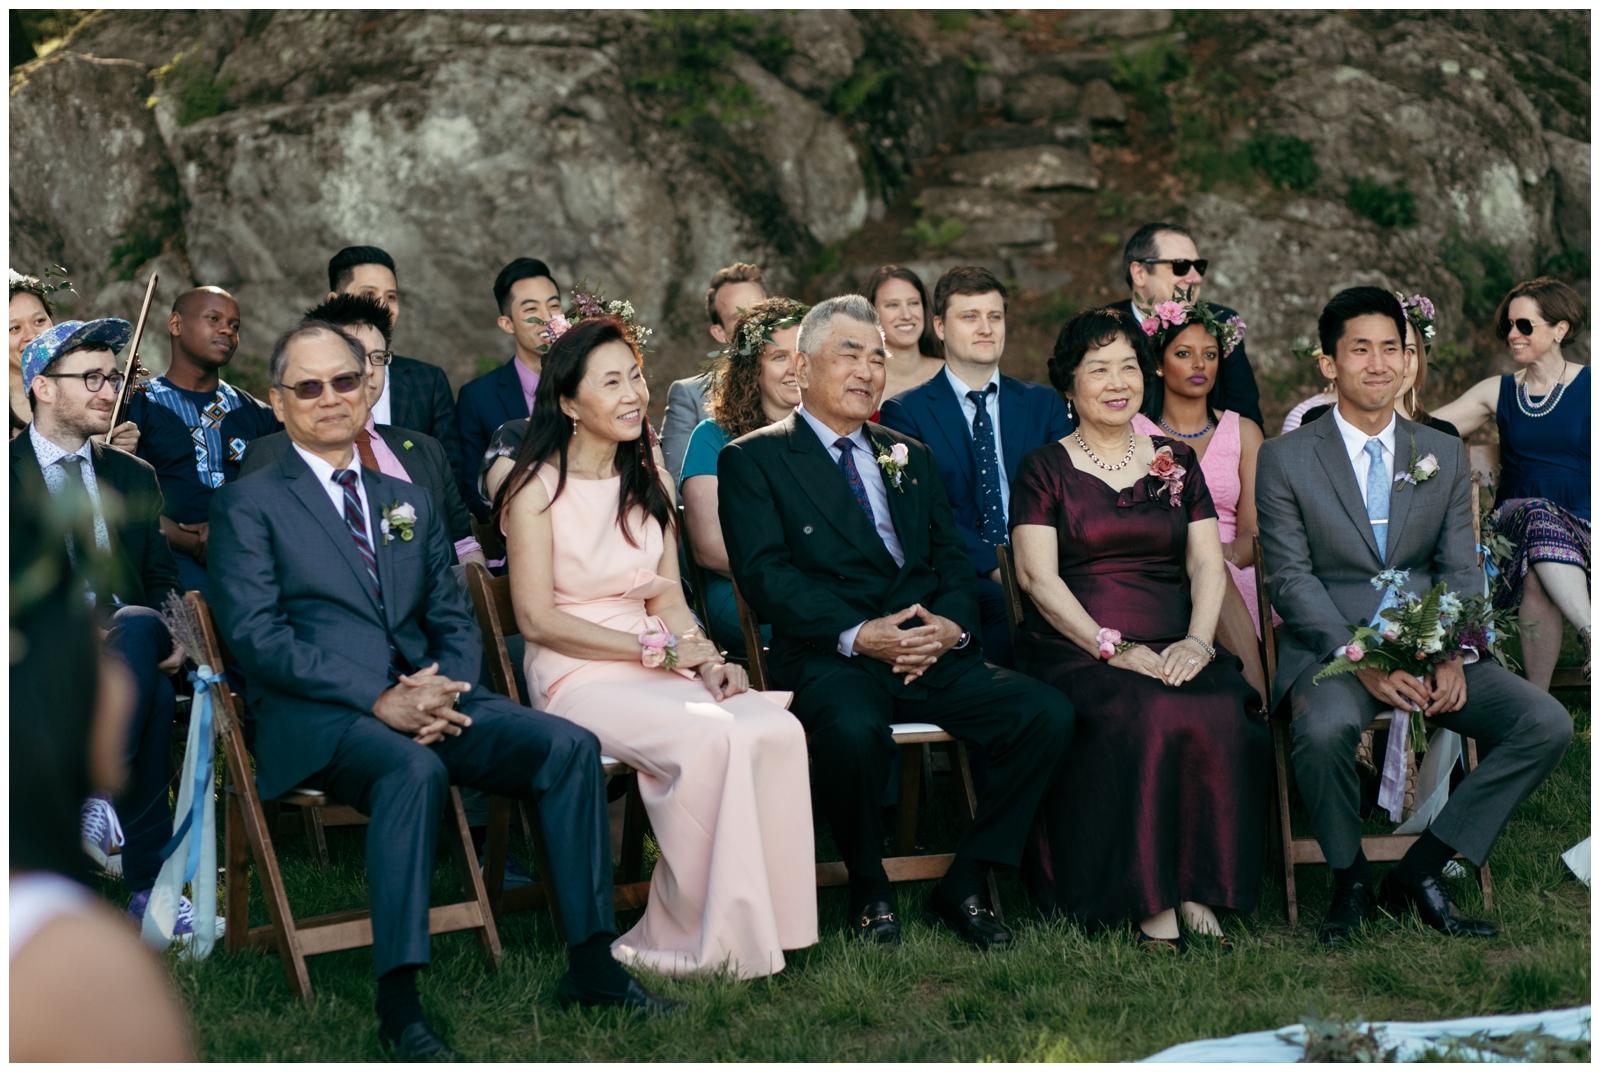 Friendly crossways retreat center wedding